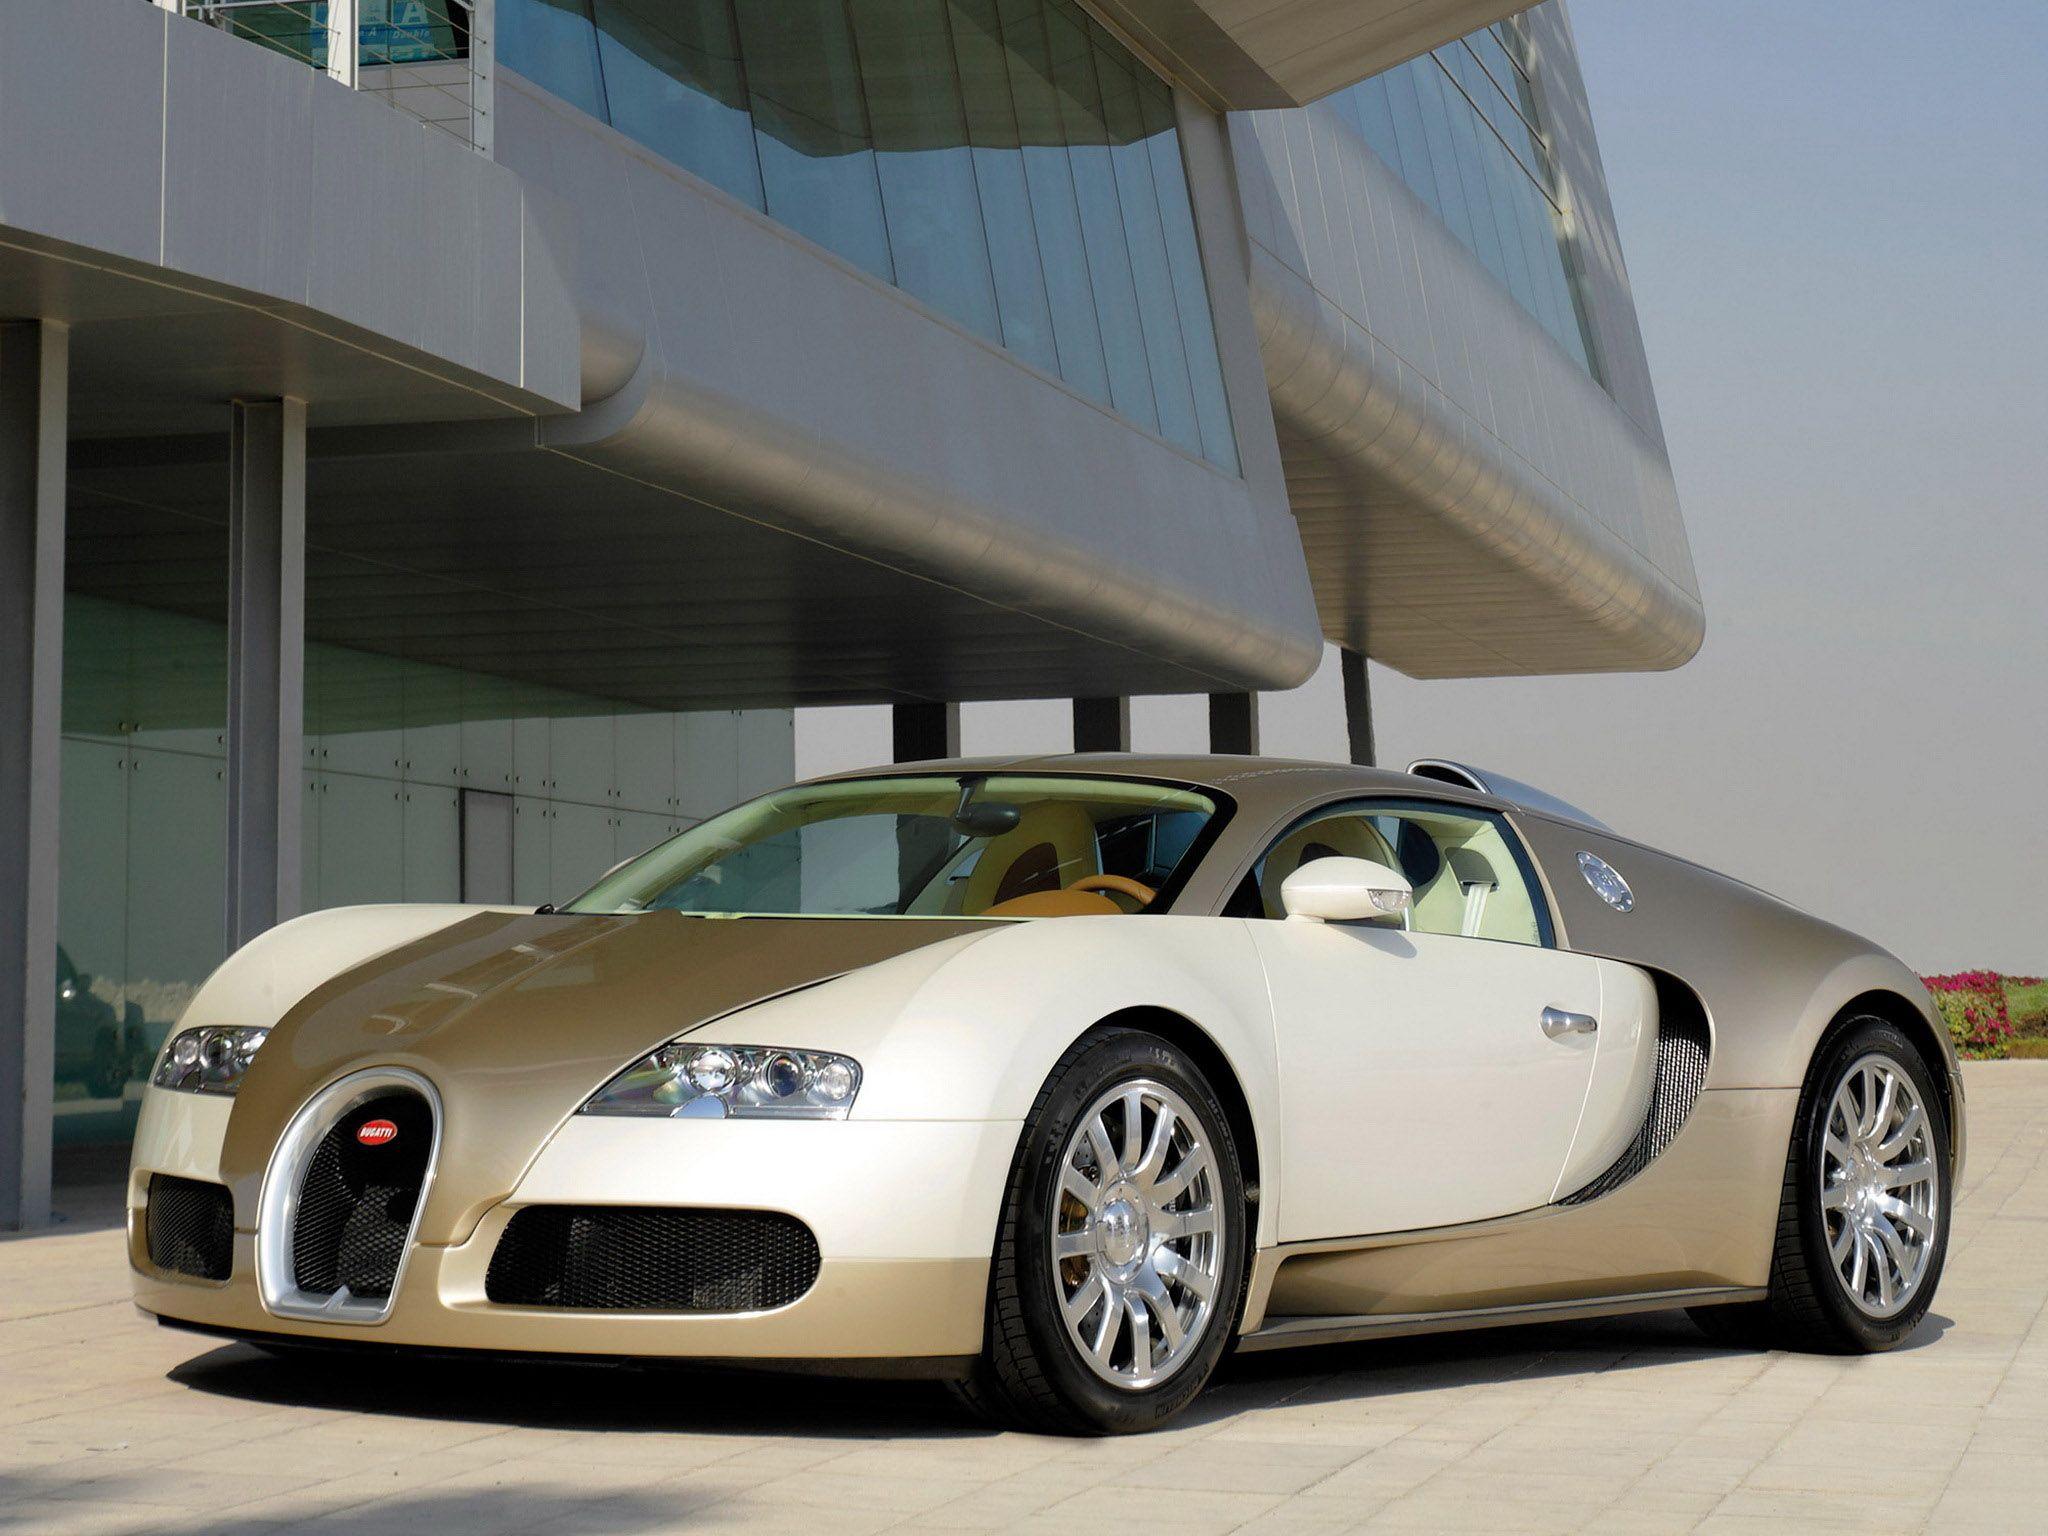 Gold Bugatti | 2014 Bugatti Veyron Gold | Top Auto Magazine ...